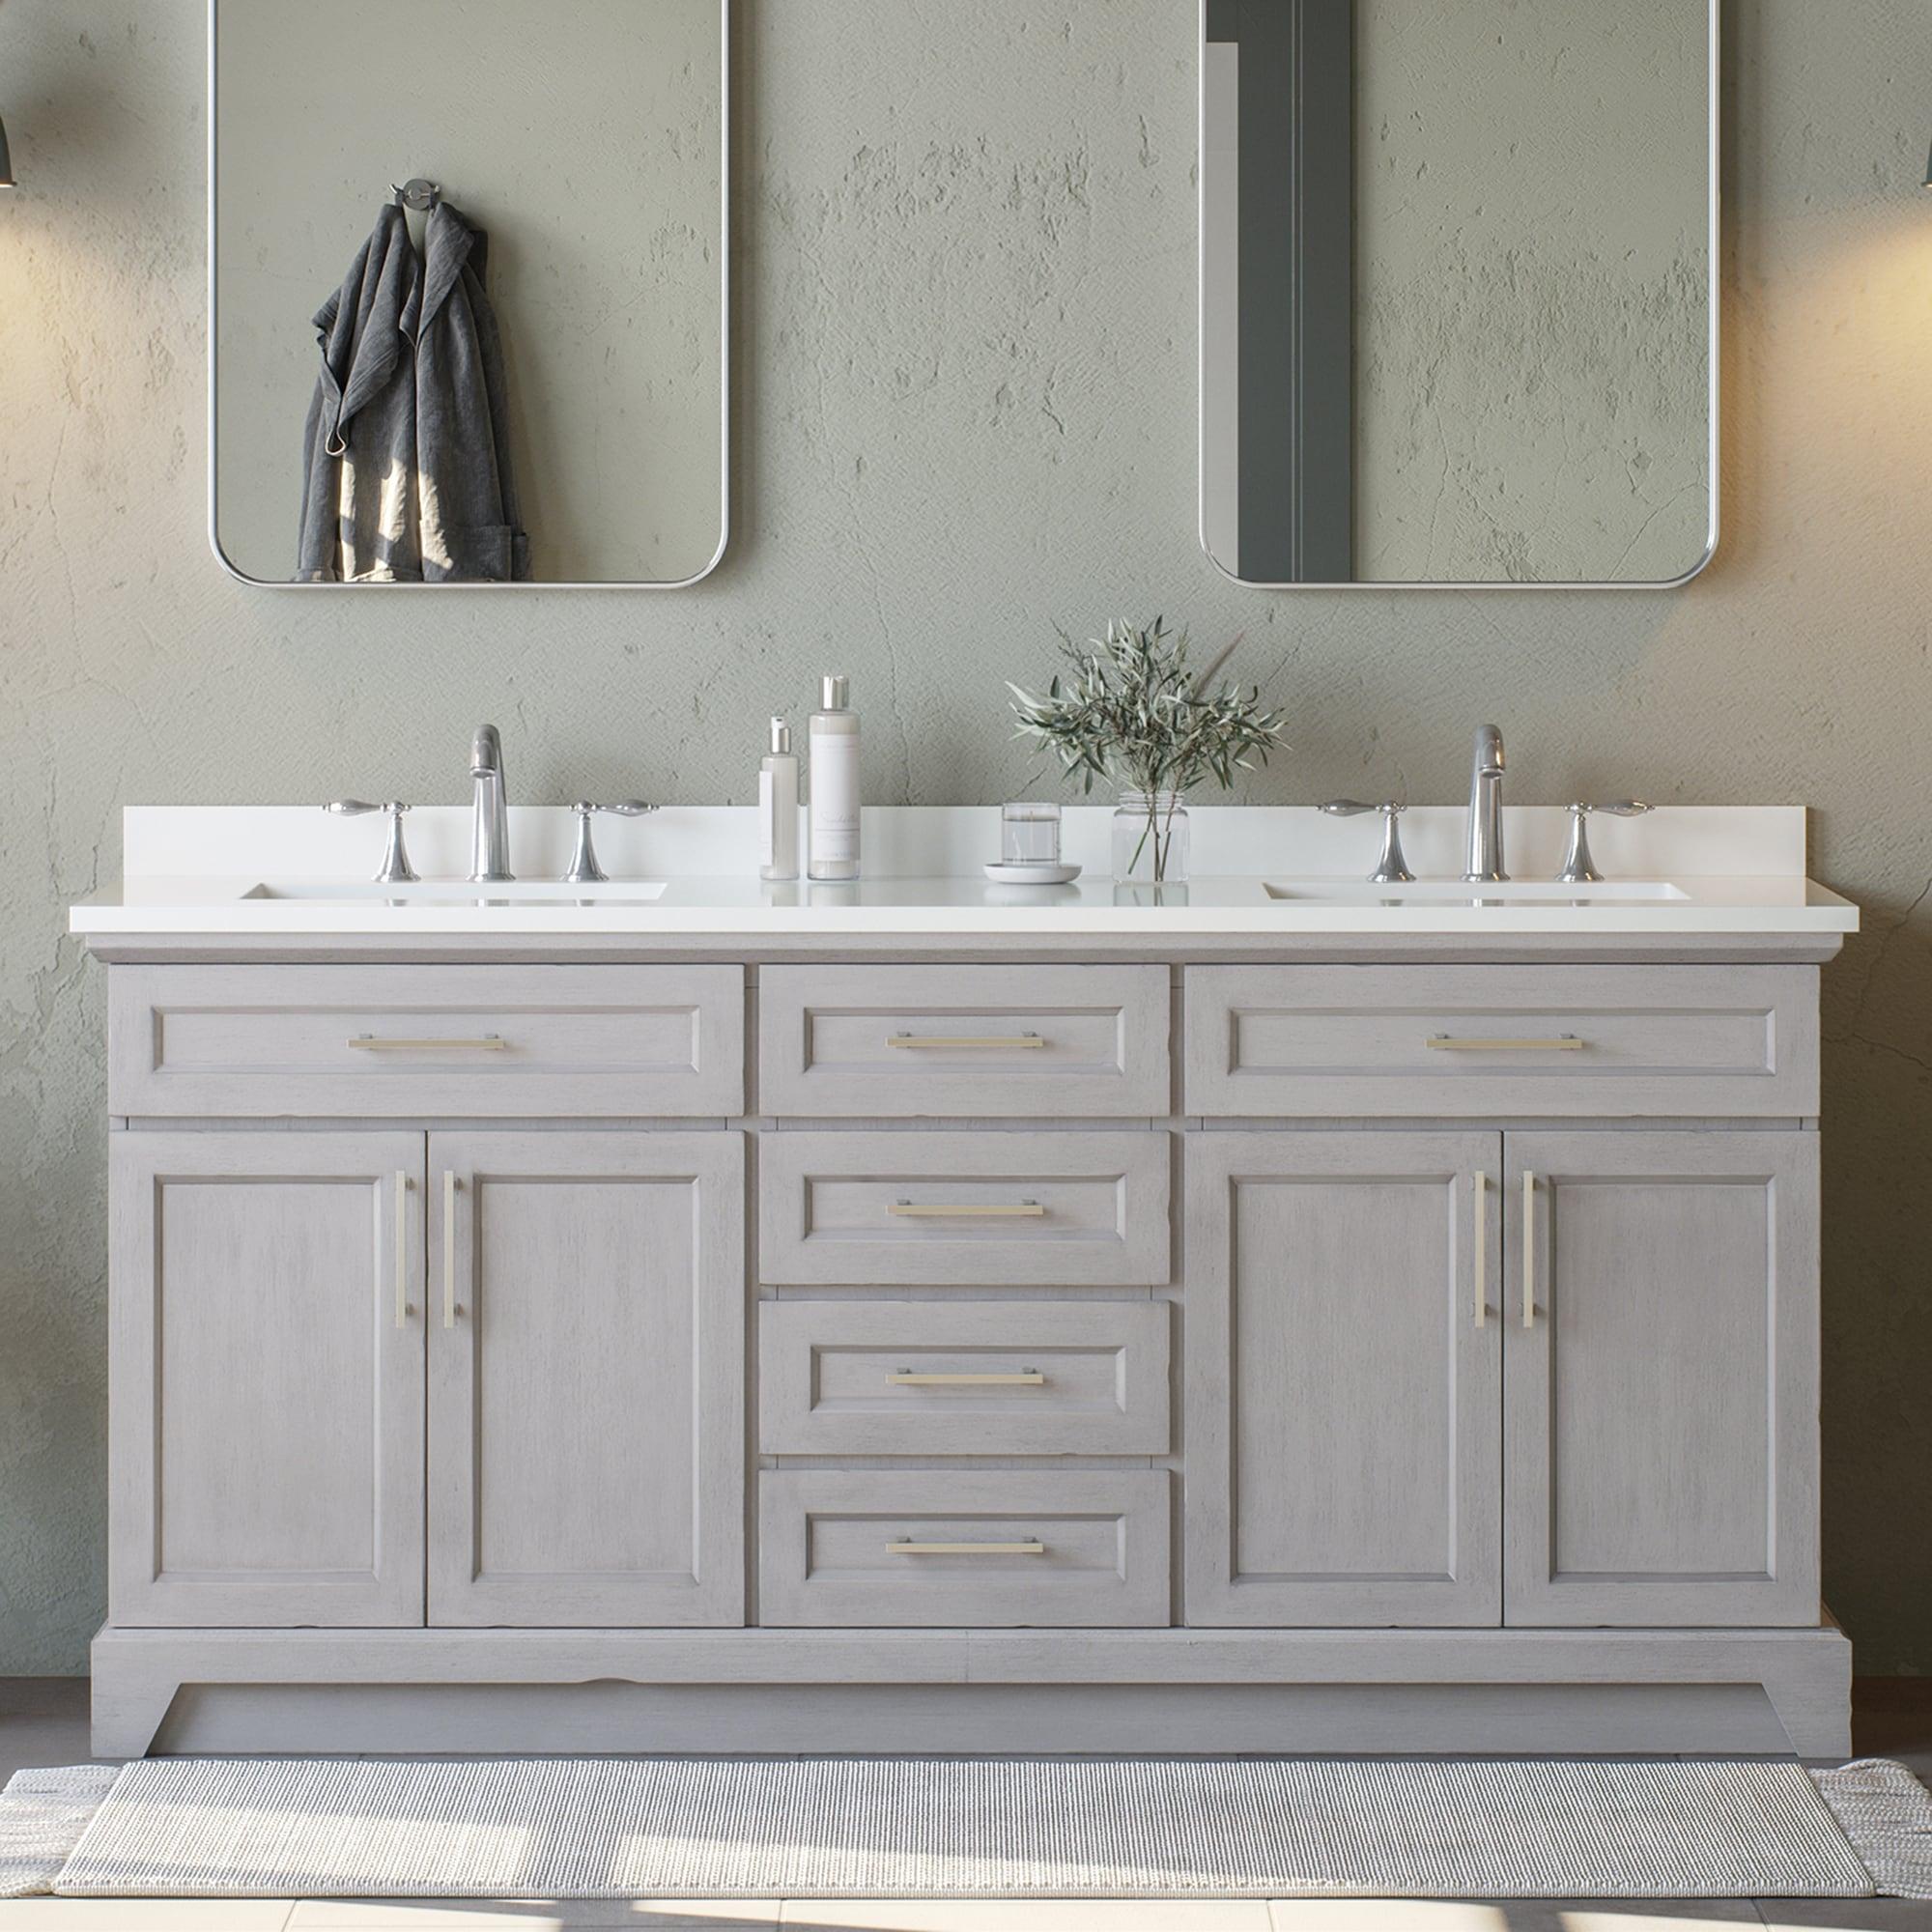 allen + roth Felix 20 in Vintage Gray Undermount Double Sink Bathroom  Vanity with White Engineered Stone Top